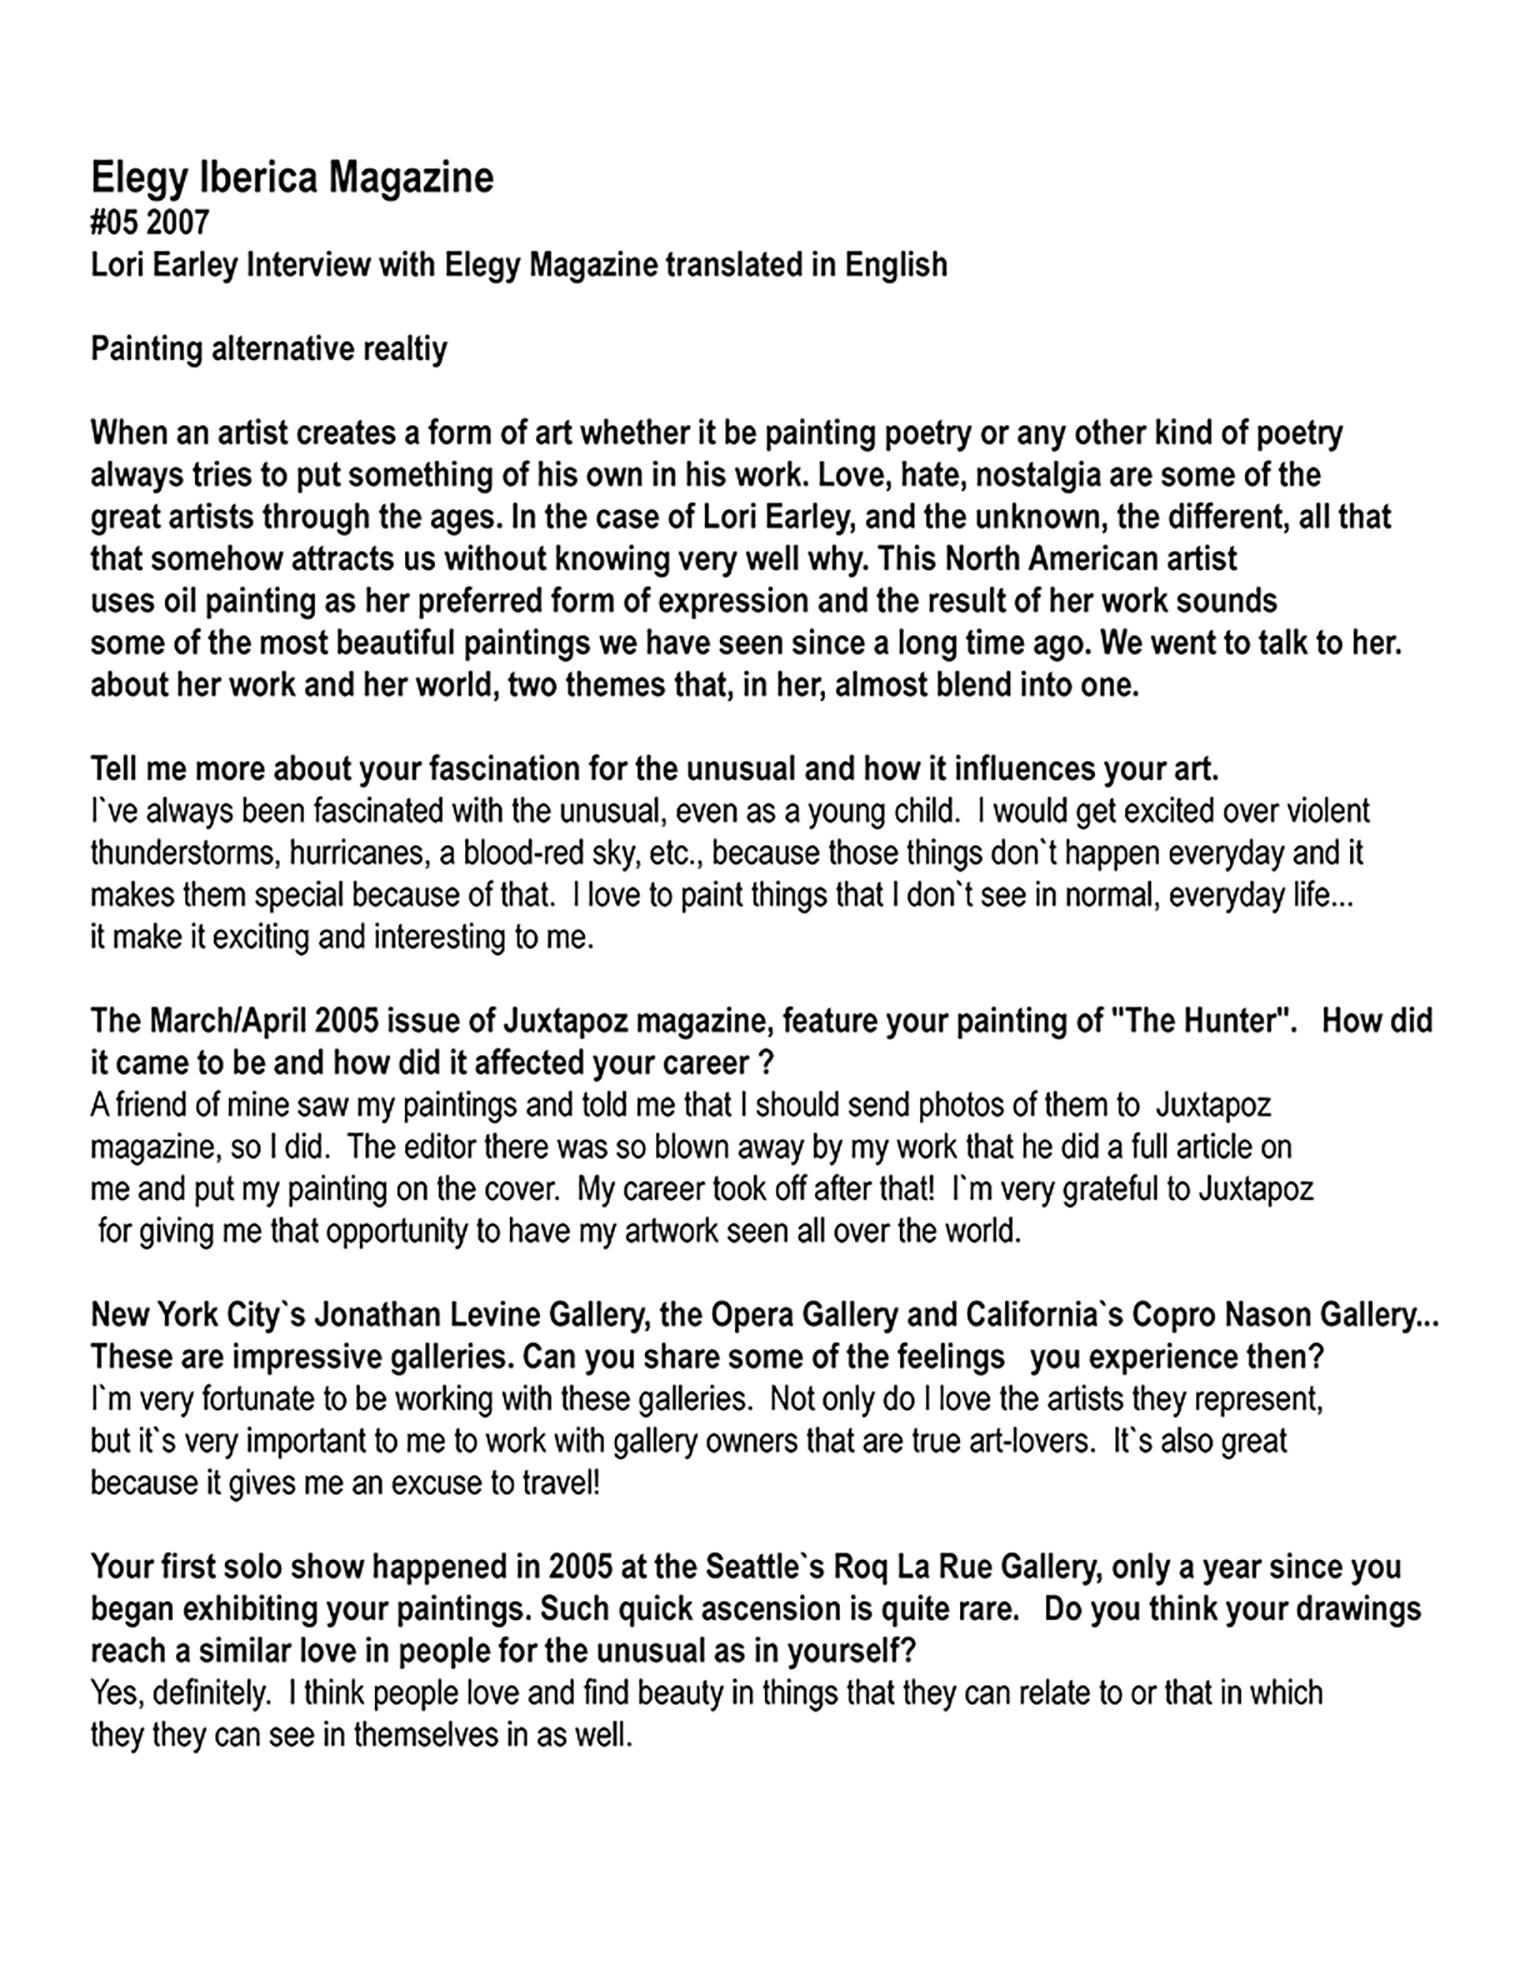 Elegy Iberica Interview text.jpg